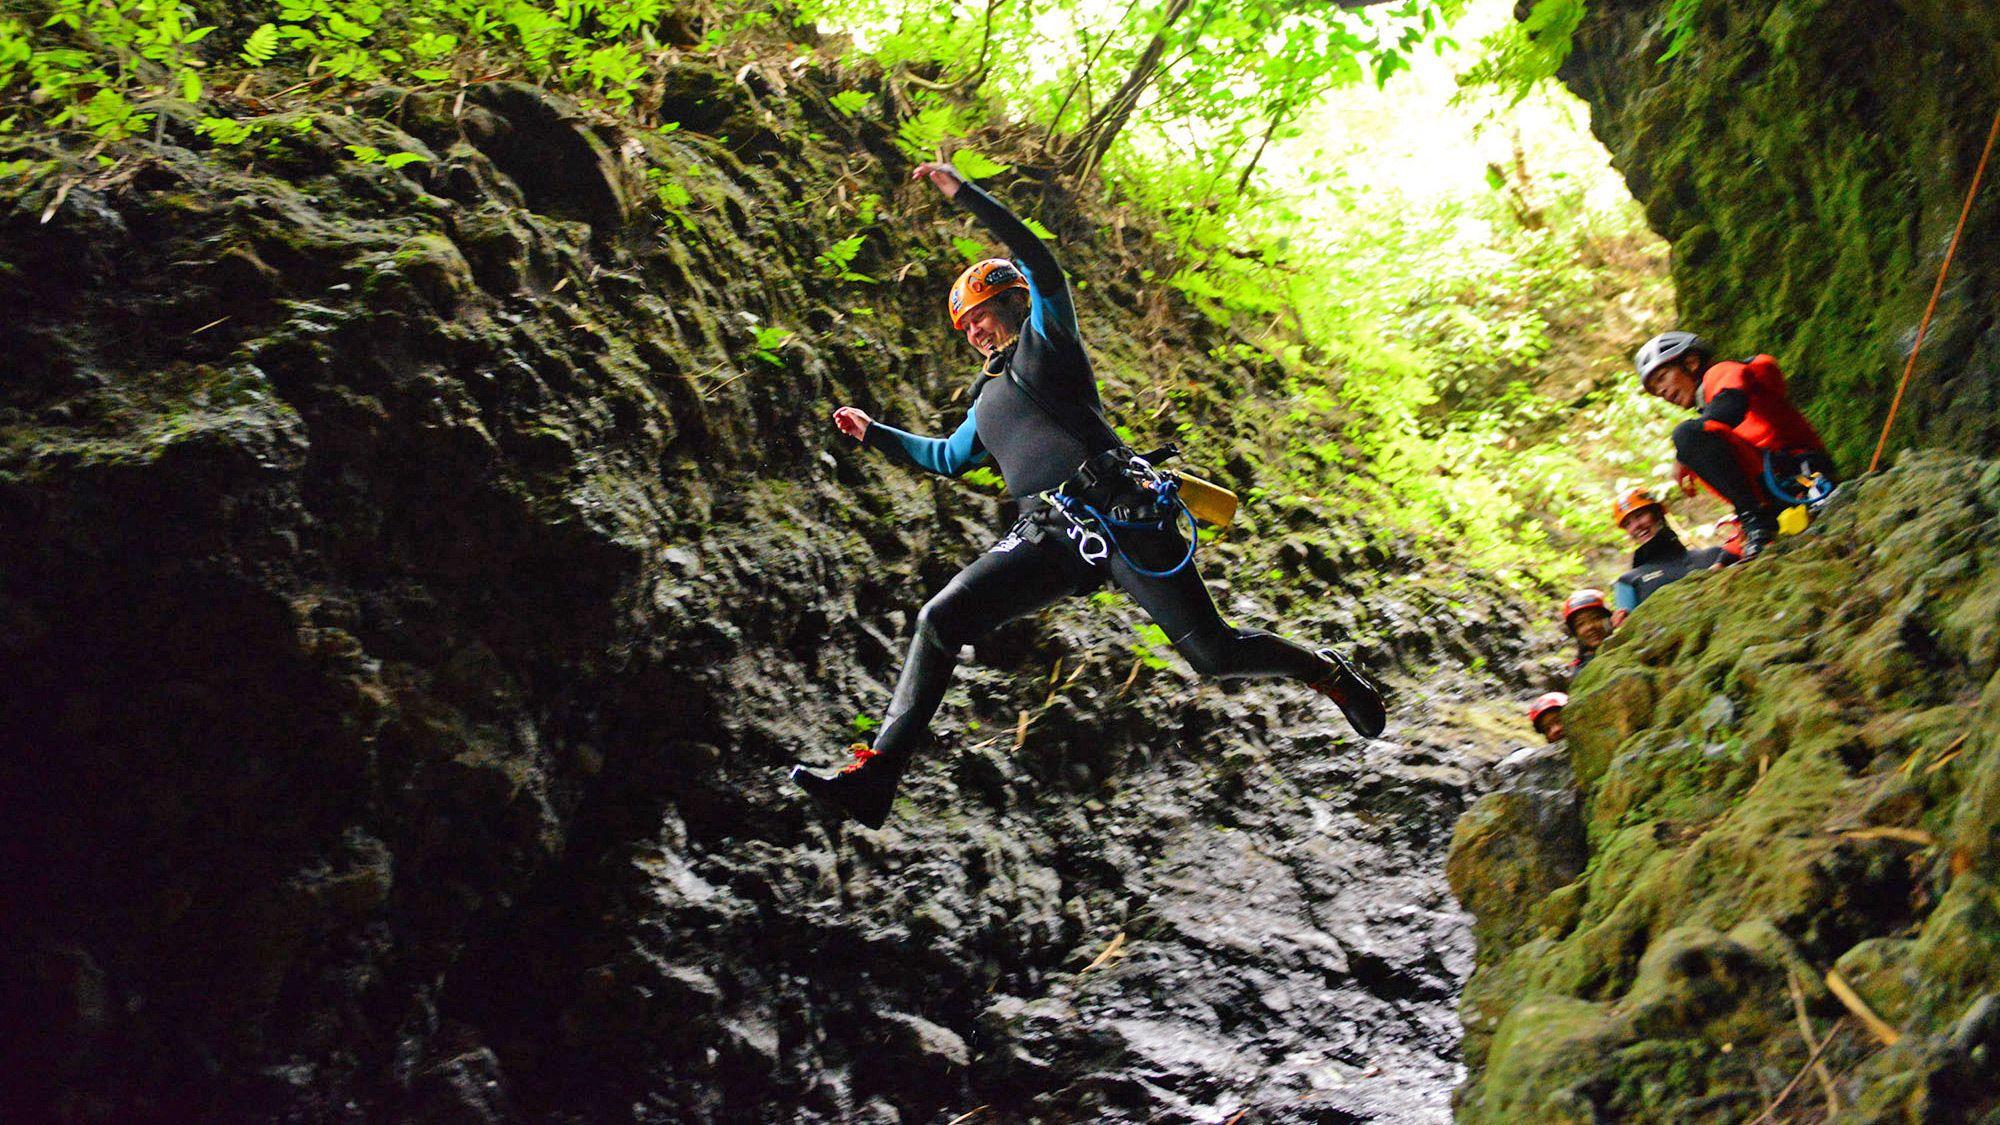 Rock climber jumps down a cliff into a pool below